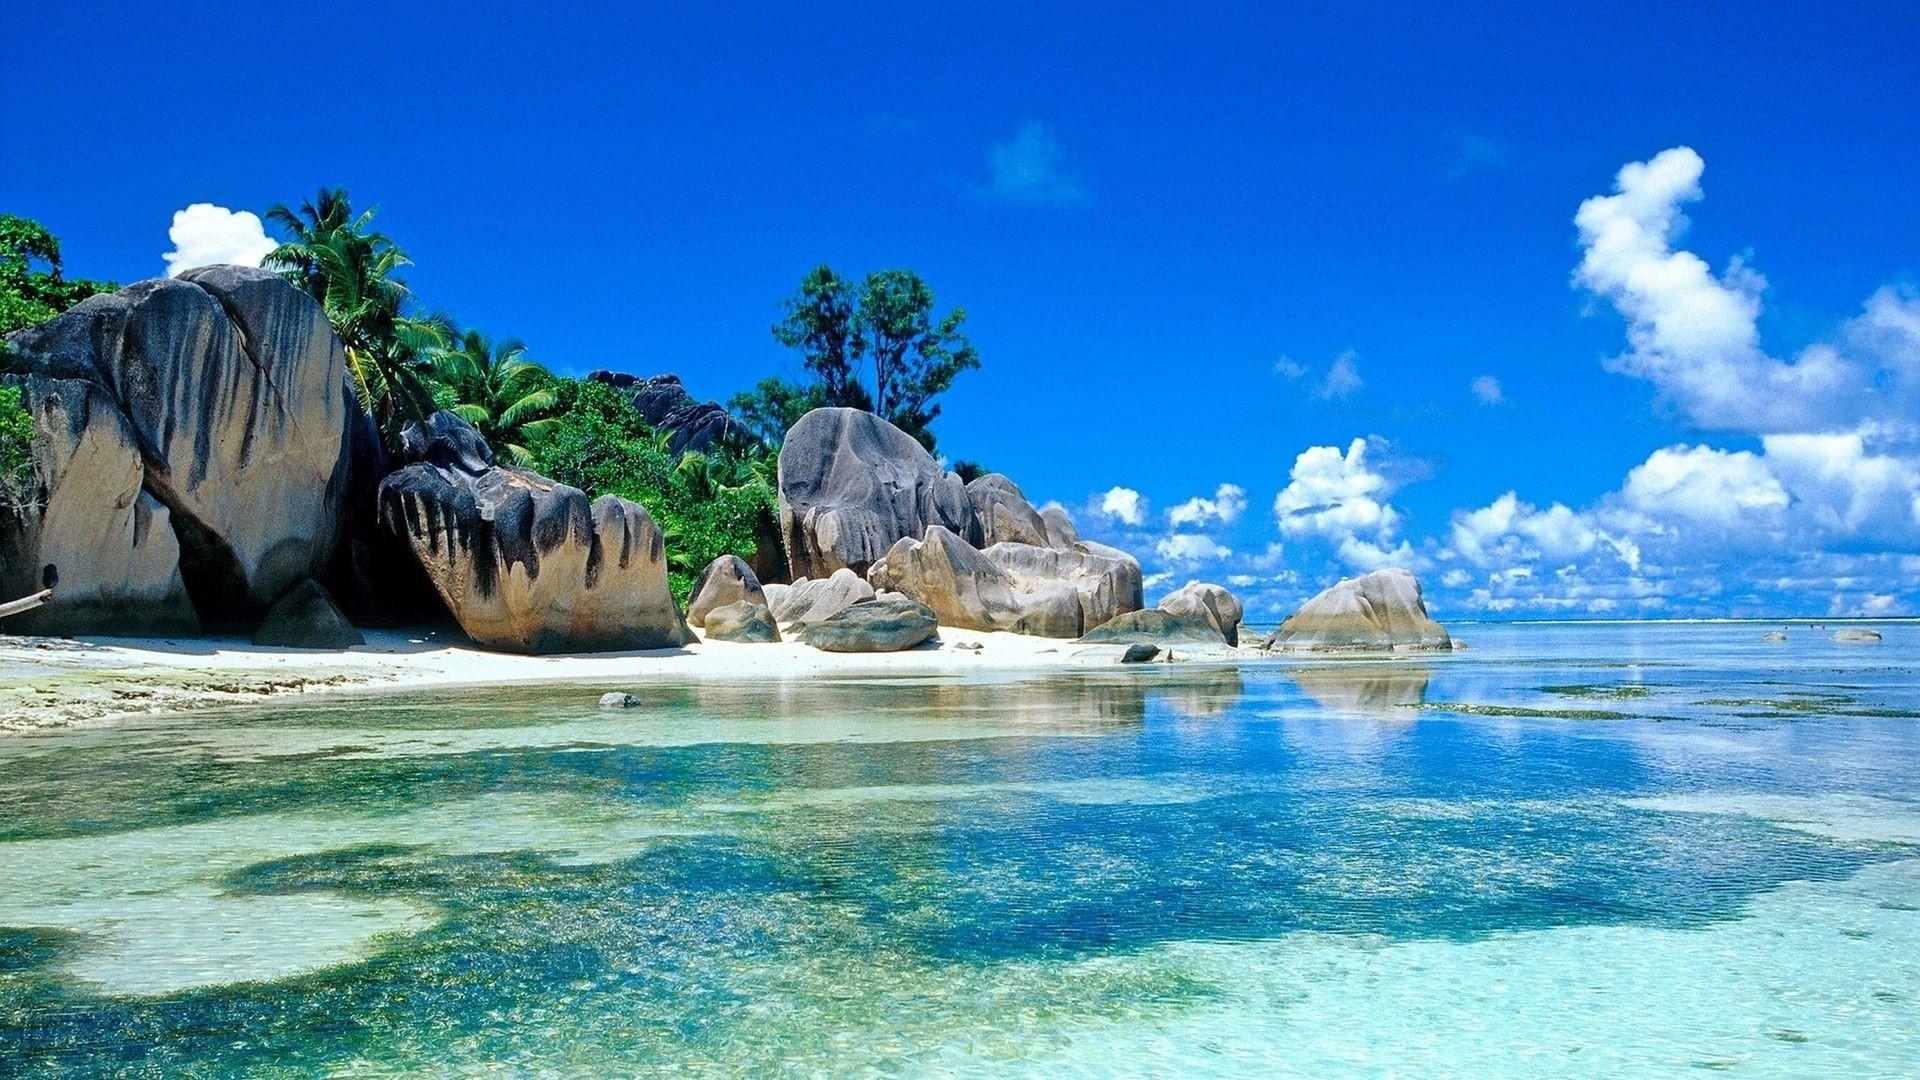 Tropical Beach Landscape Mobile HD Wallpaper